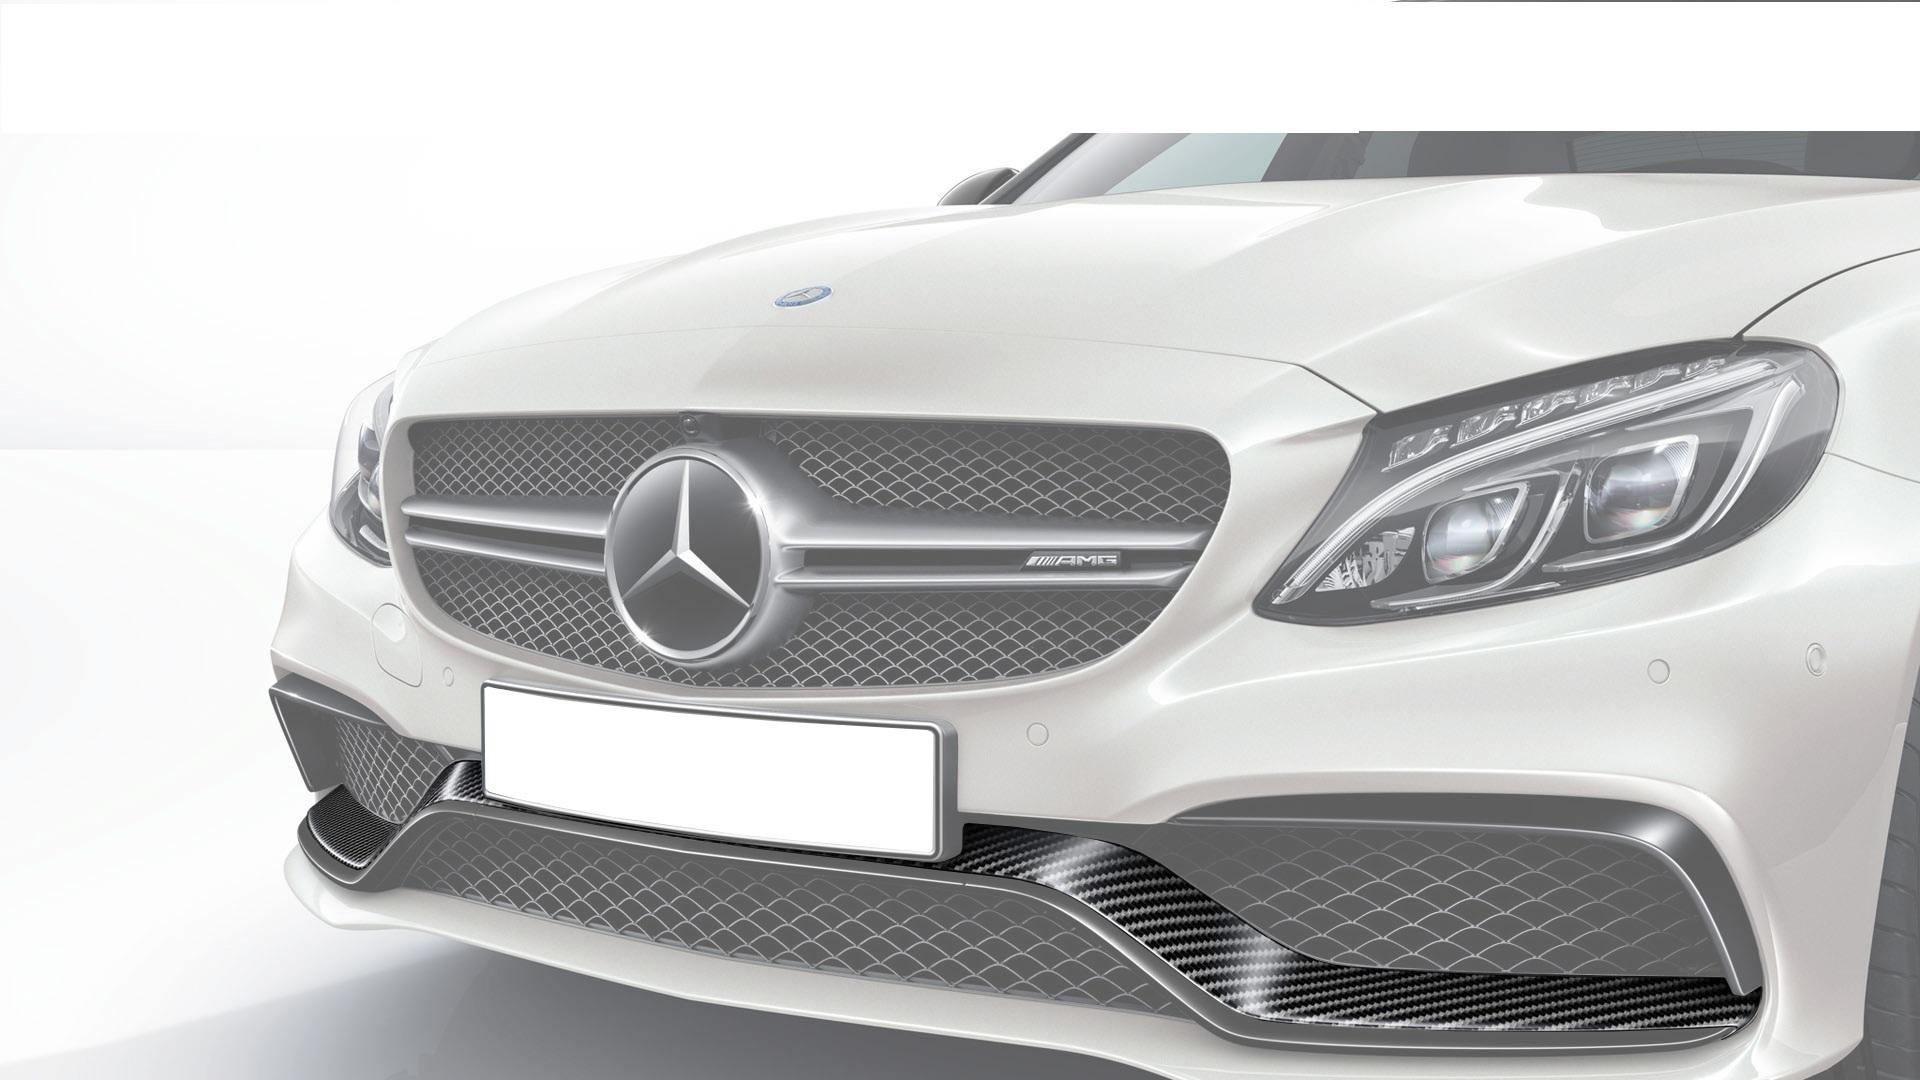 Hodoor Performance Carbon fiber front bumper spoiler AMG Style for Mercedes C-class W205